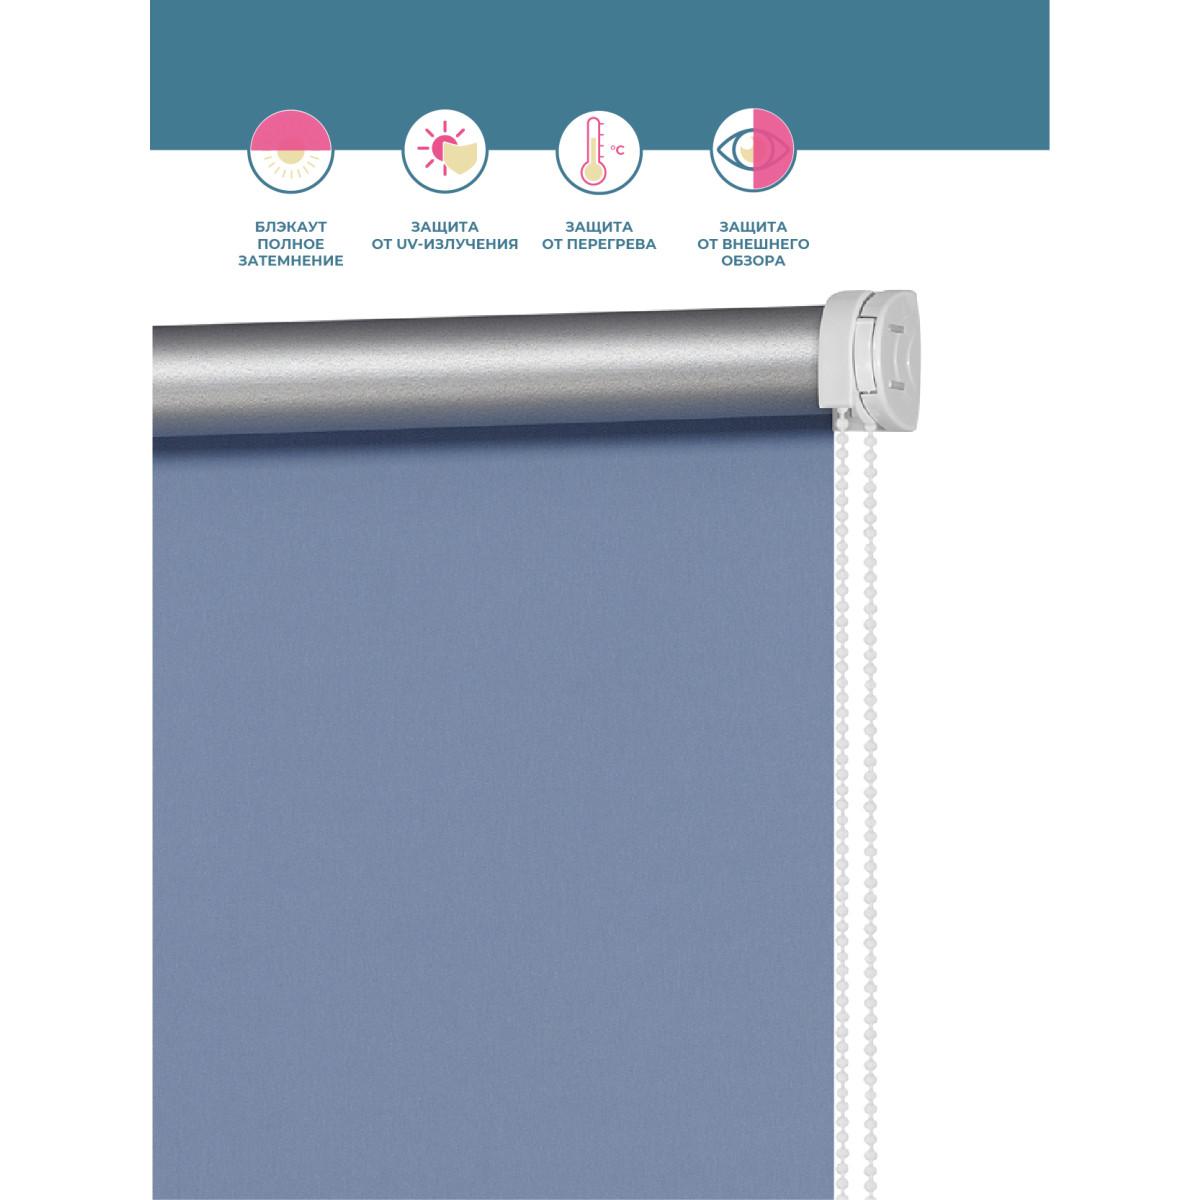 Рулонная Ора Decofest Блэкаут Плайн 70Х160 Цвет Синий